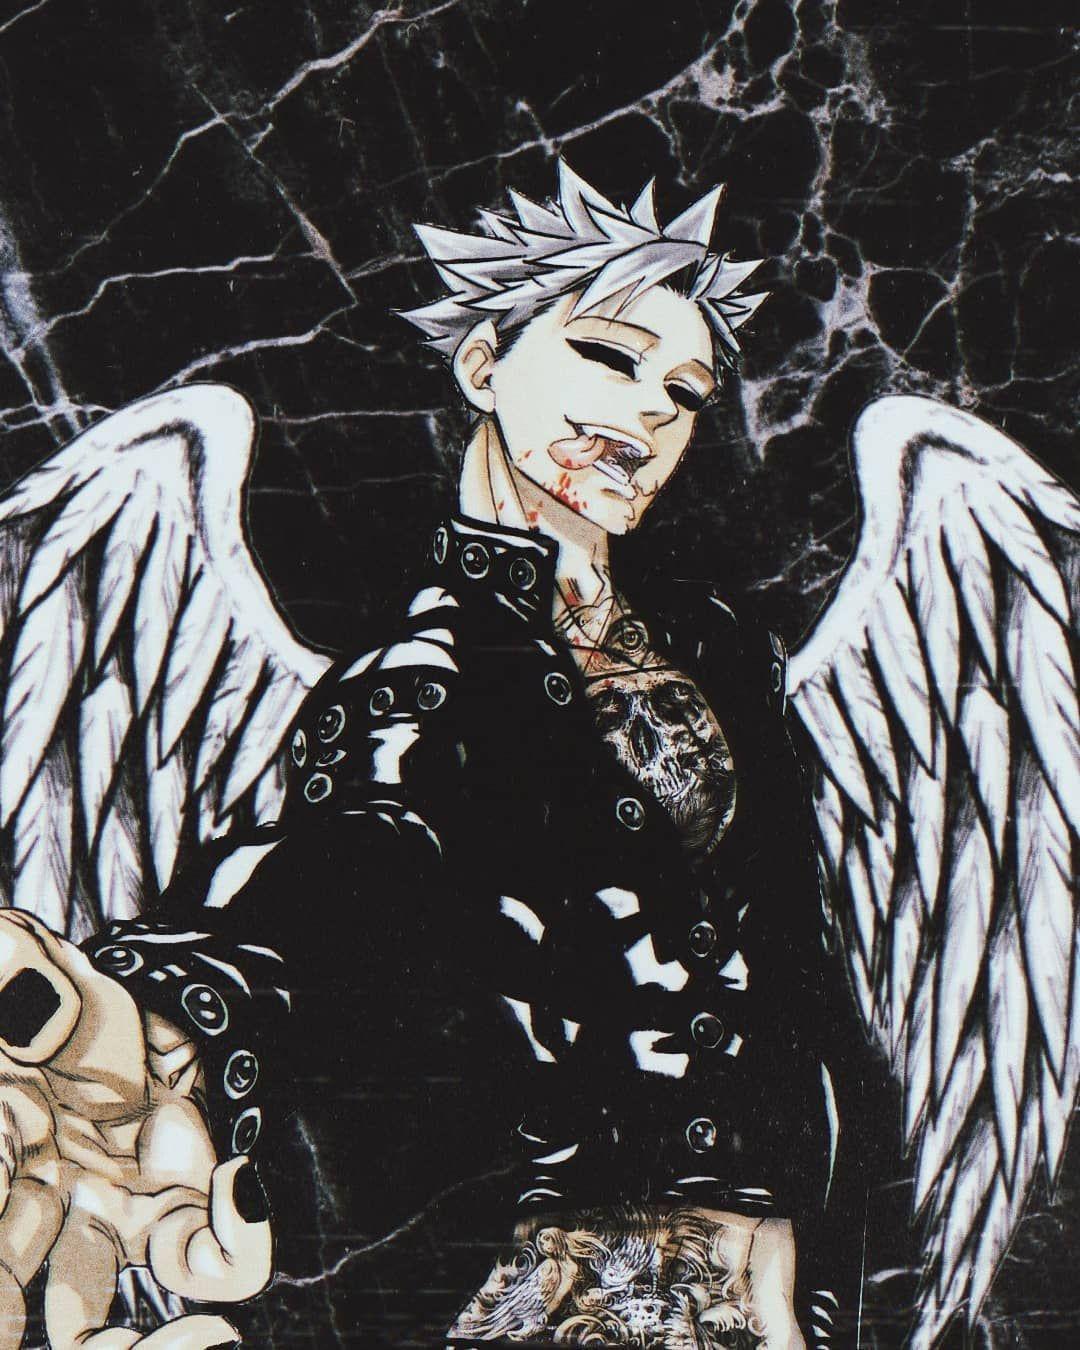 Pin by Saidahj on Creepy in 2020 Dark anime, Anime, Dark